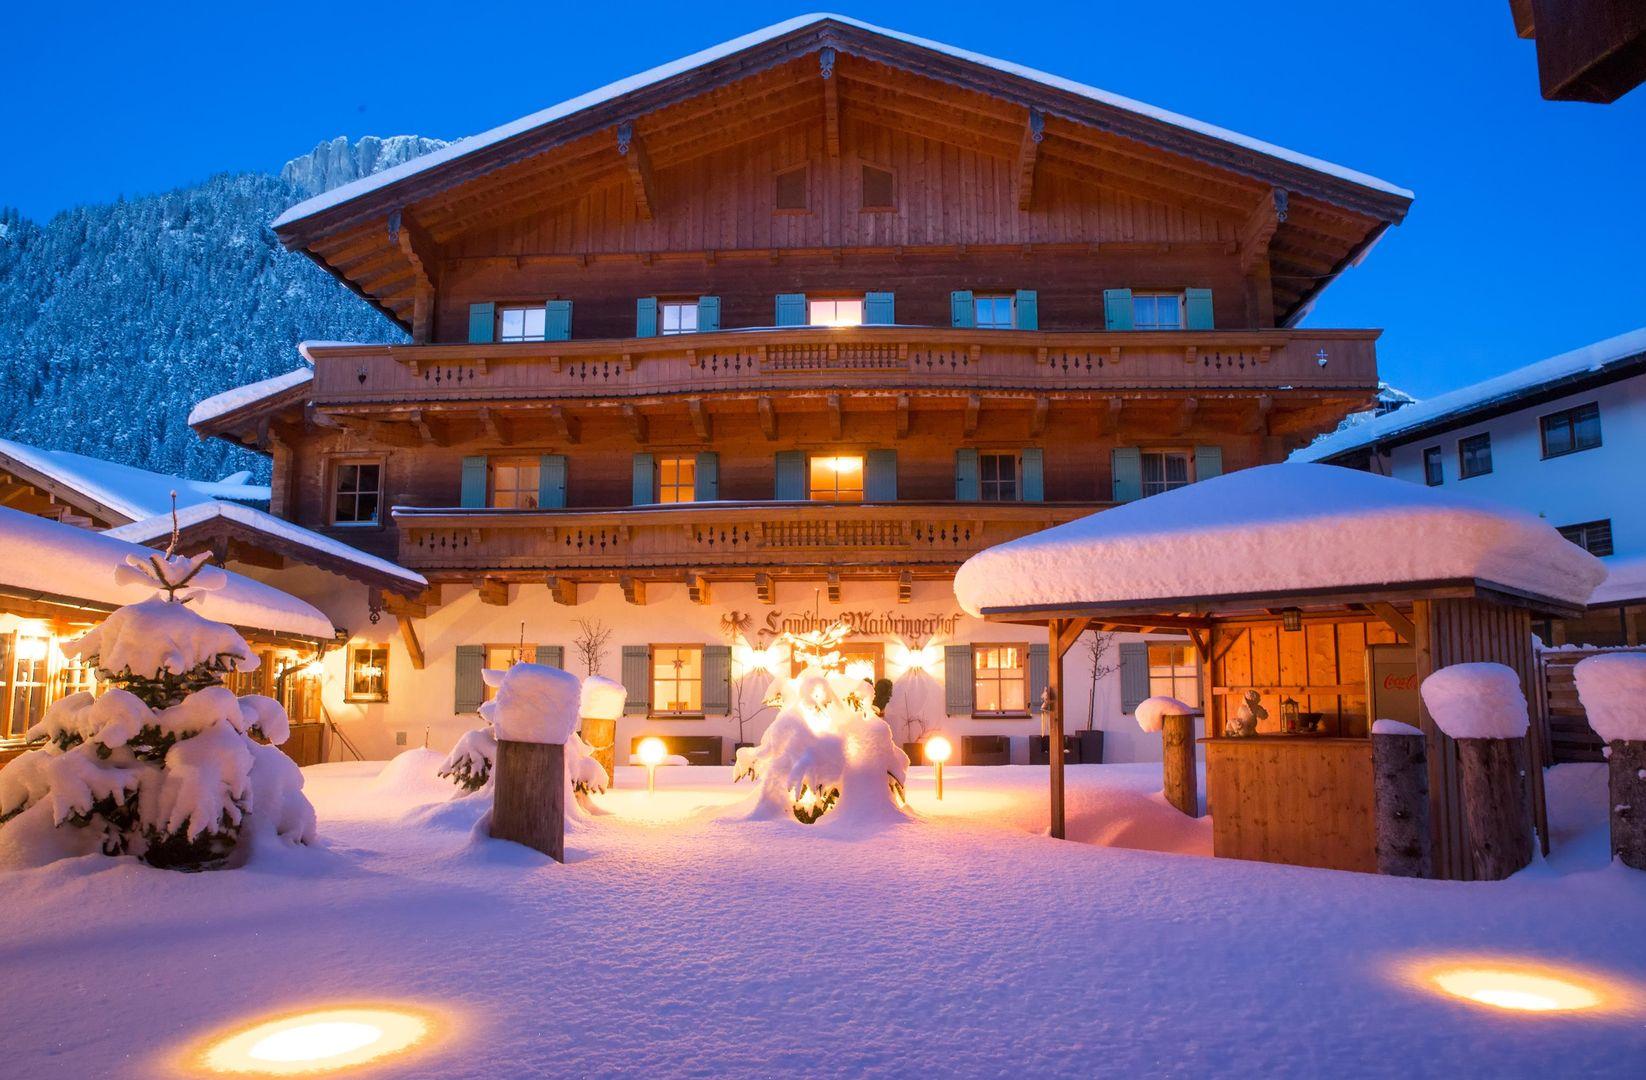 hotel waidringerhof - 1. tiroler gluckshotel